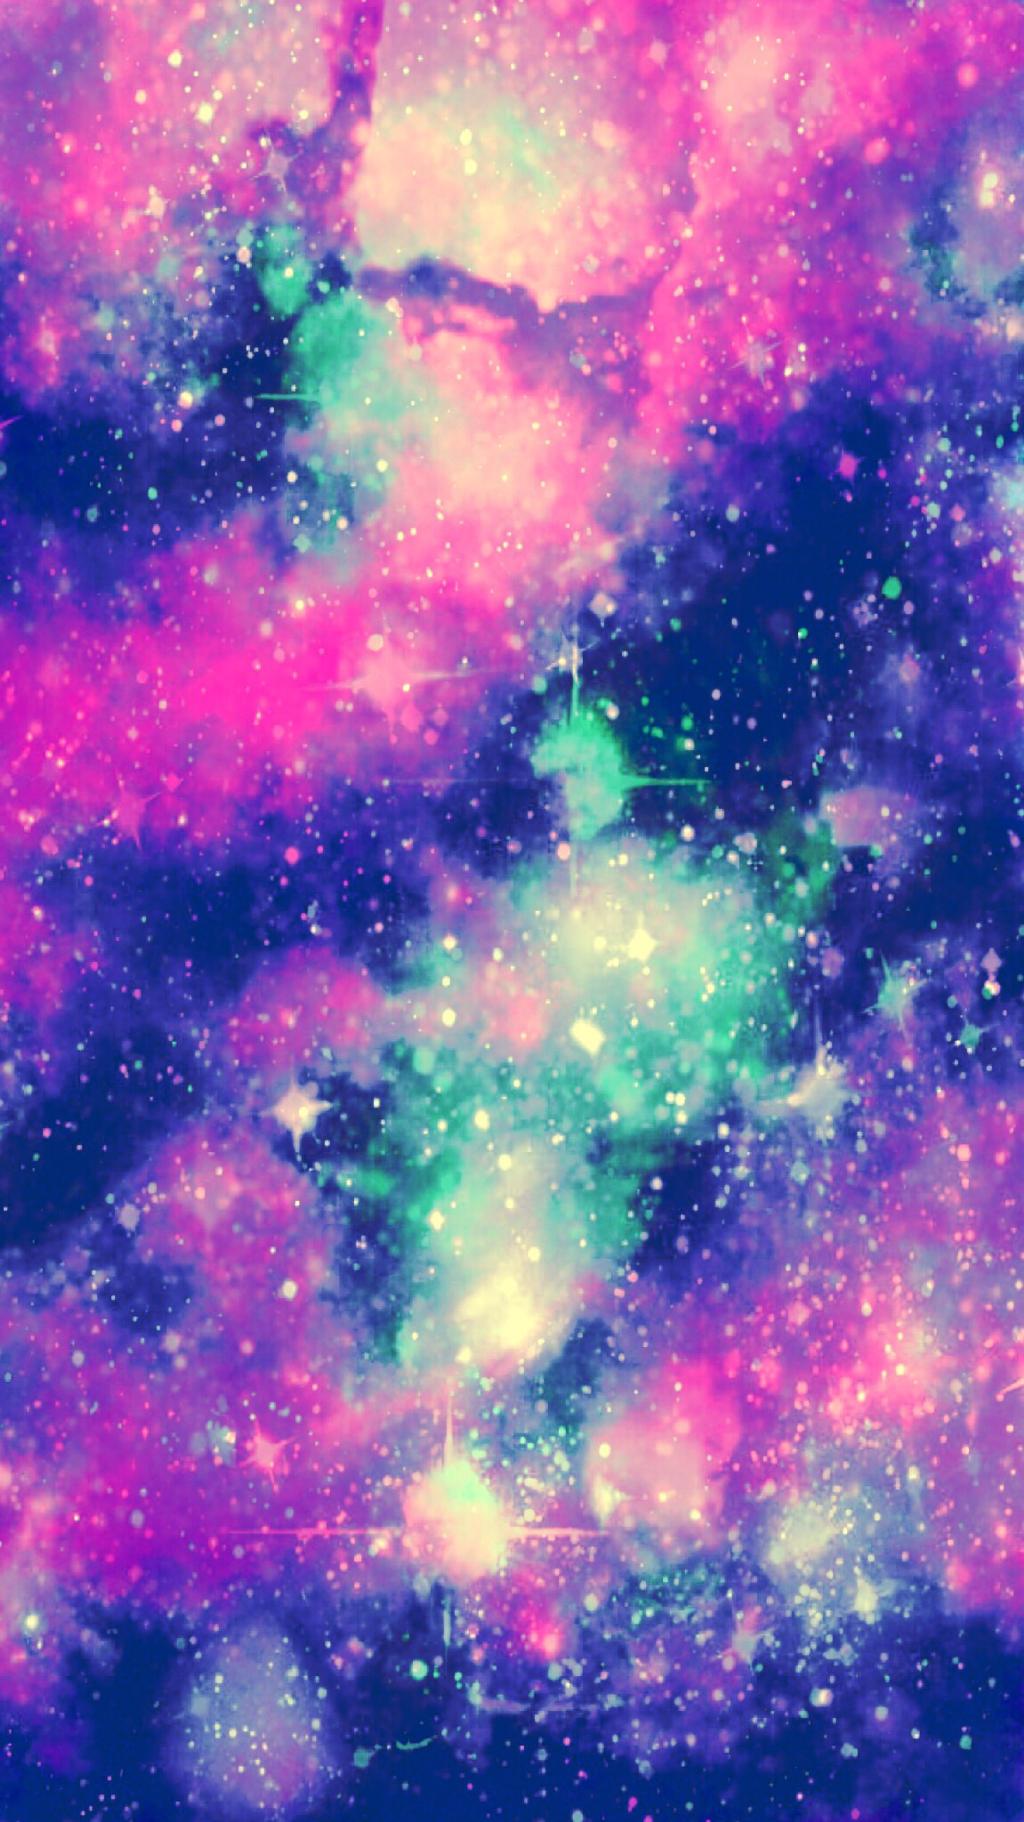 Ftestickers Galaxy Sky Glitter Sparkle Stars Pink Purple Background Overlay Freesti In 2020 Anime Scenery Wallpaper Galaxy Wallpaper Purple Wallpaper Iphone